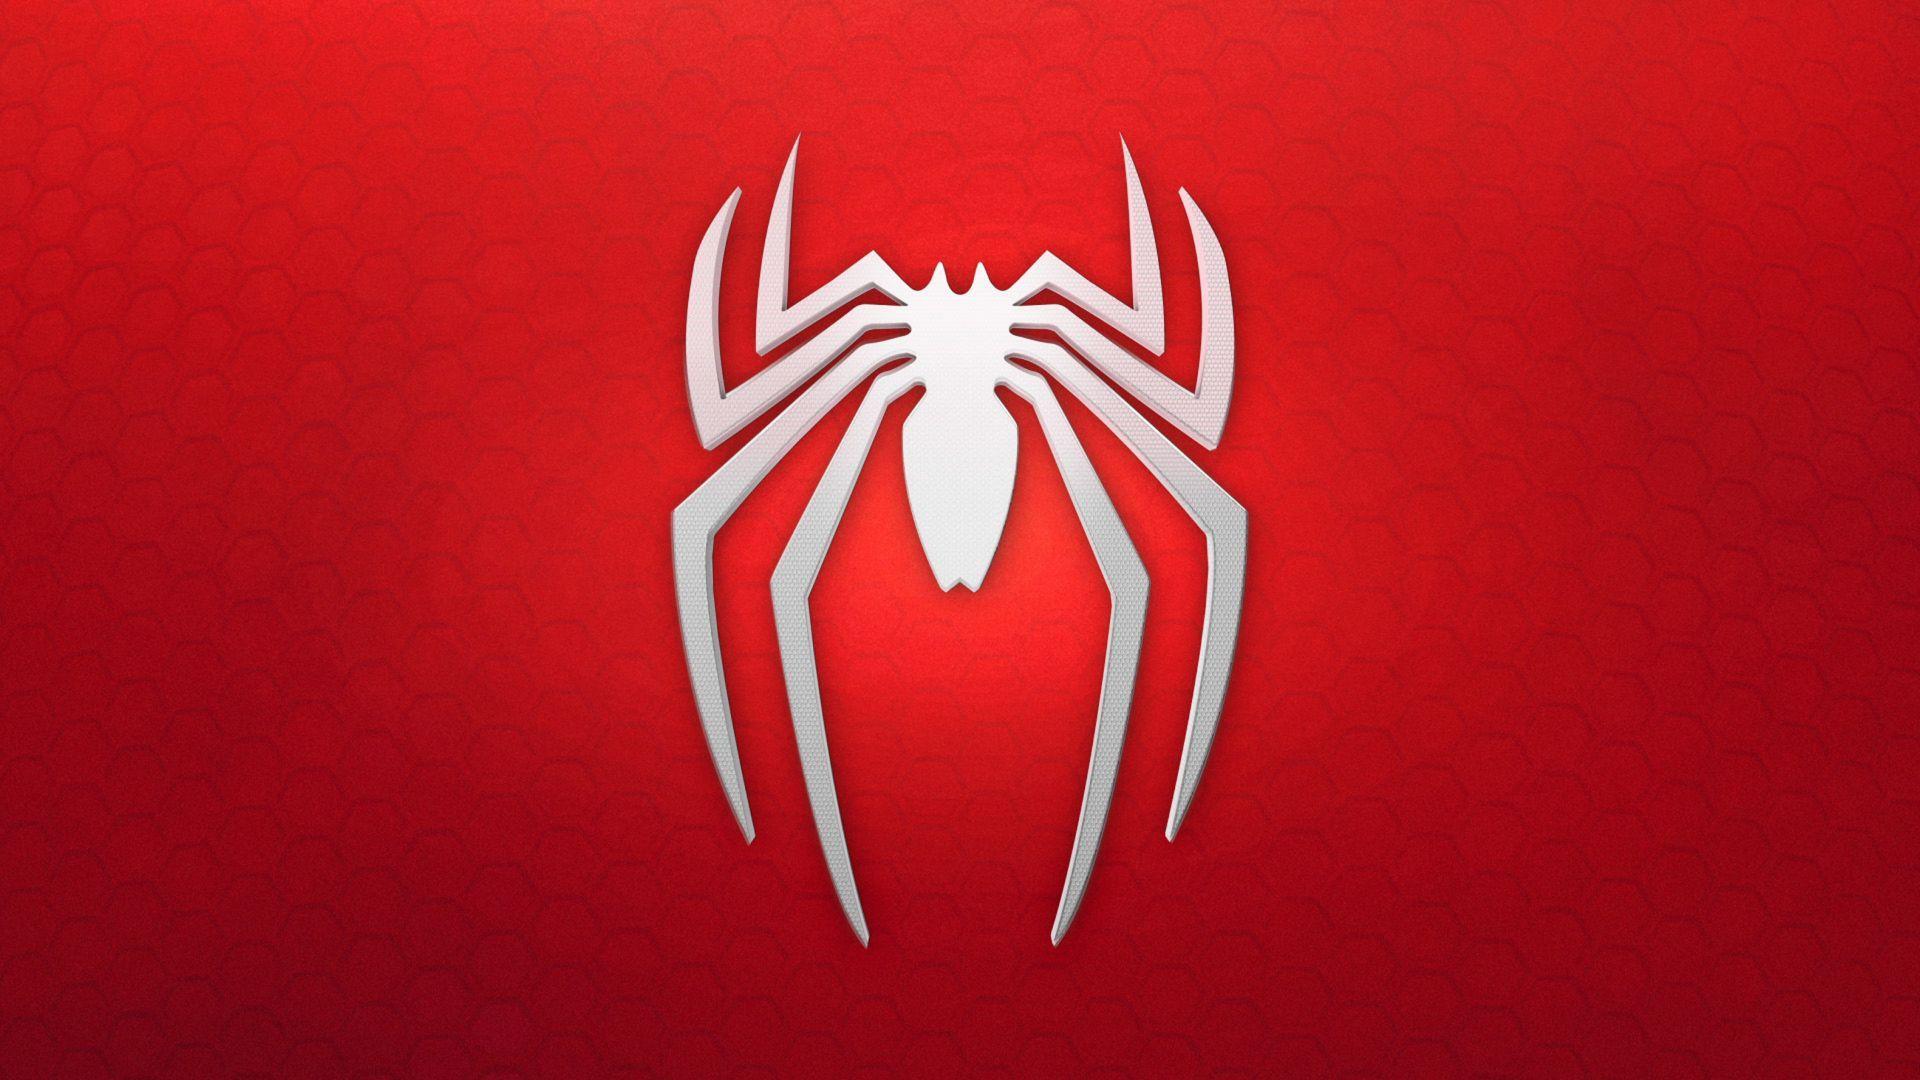 spiderman, logo, background, red, white (horizontal.